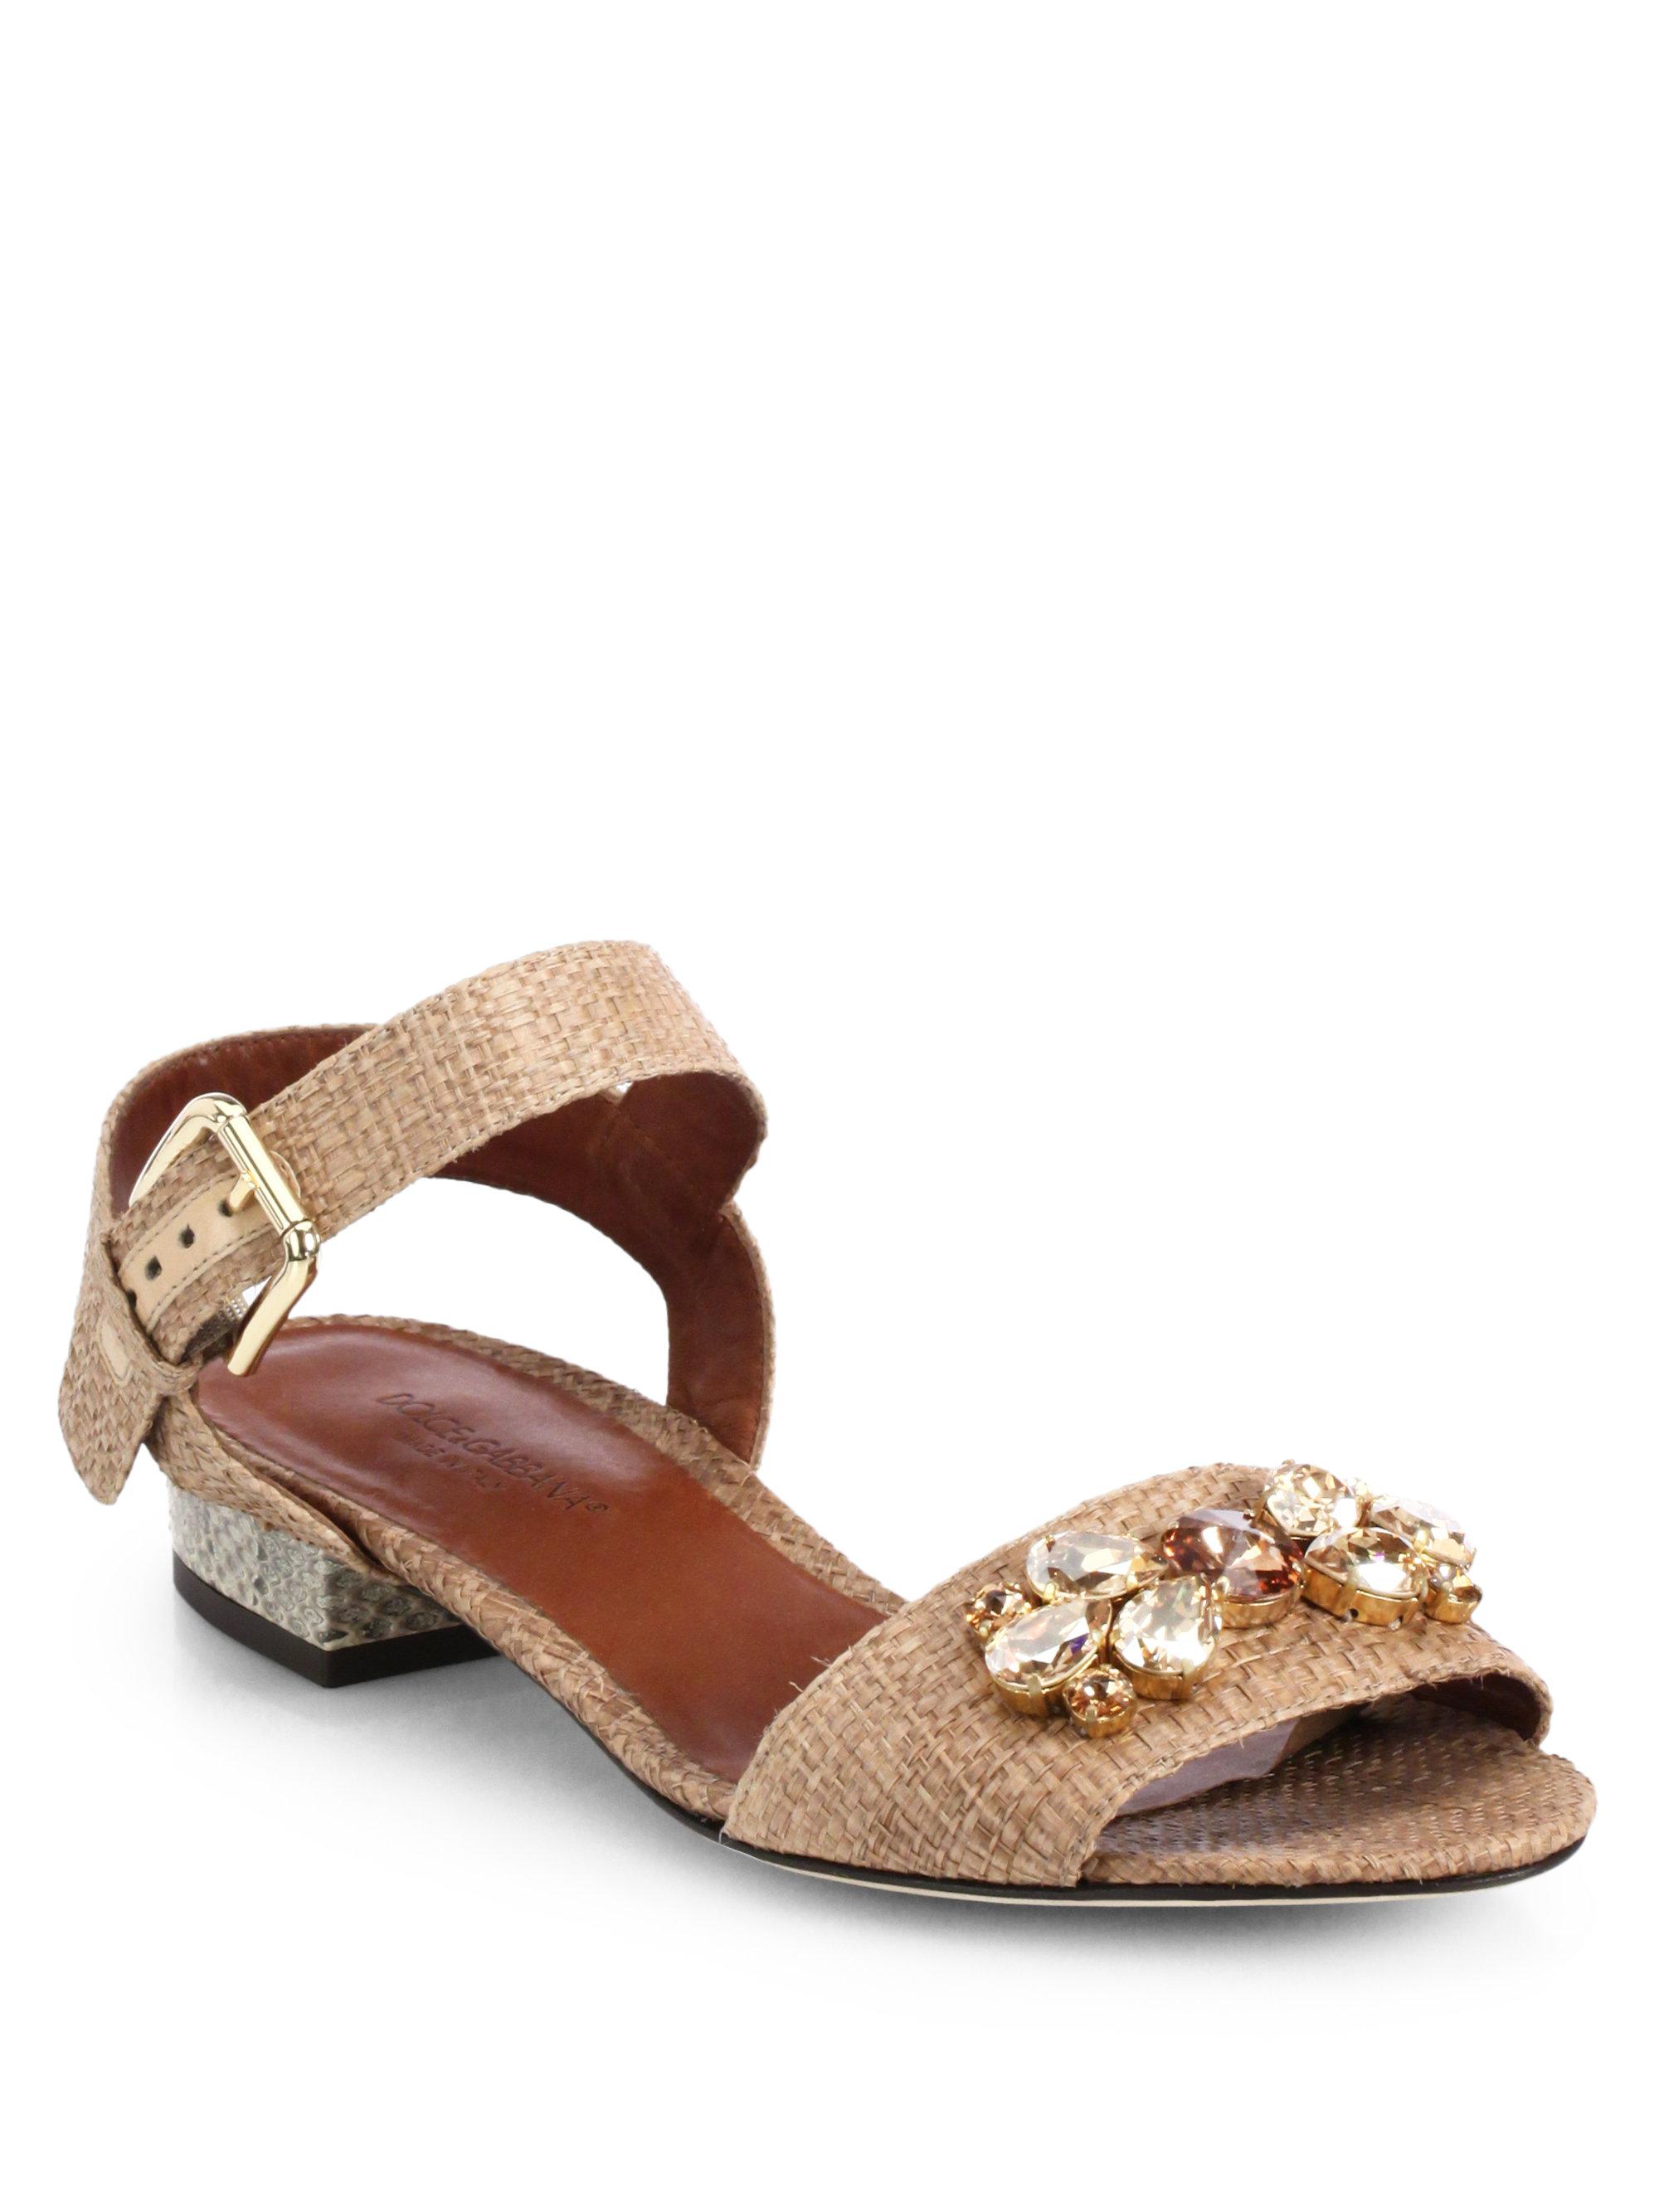 e51ad8fe64fd1 Lyst - Dolce   Gabbana Jeweled Raffia Snakeskin Sandals in Brown